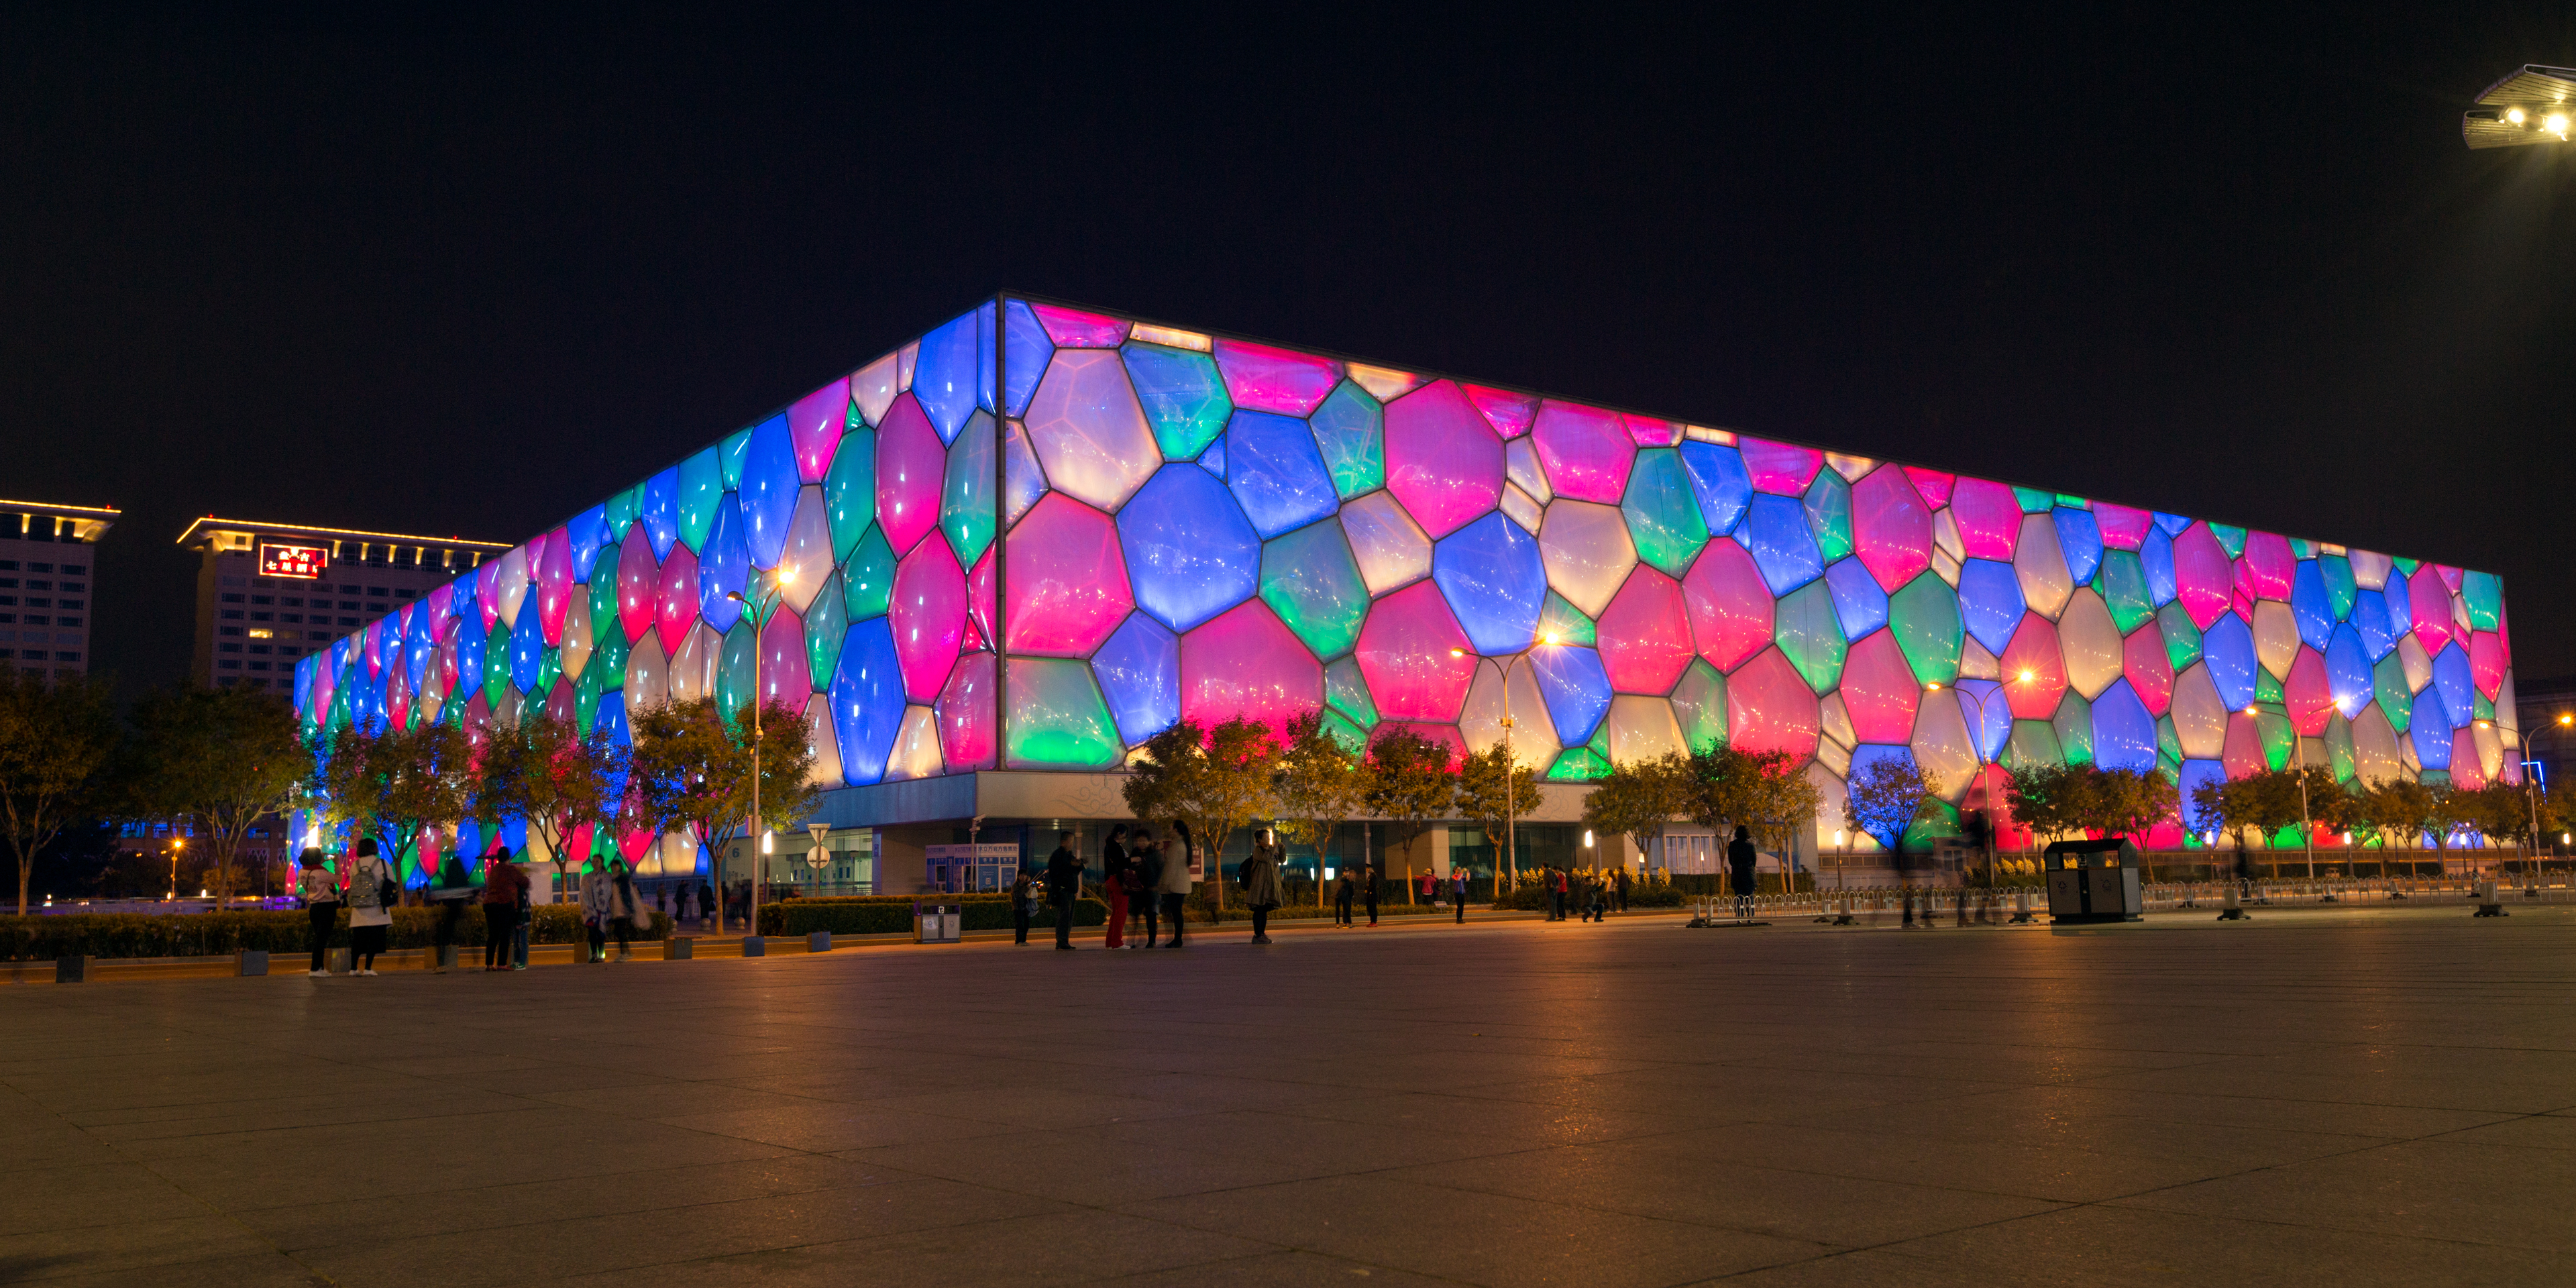 File:Beijing National Aquatics Centre 2016 October.jpg - Wikimedia Commons